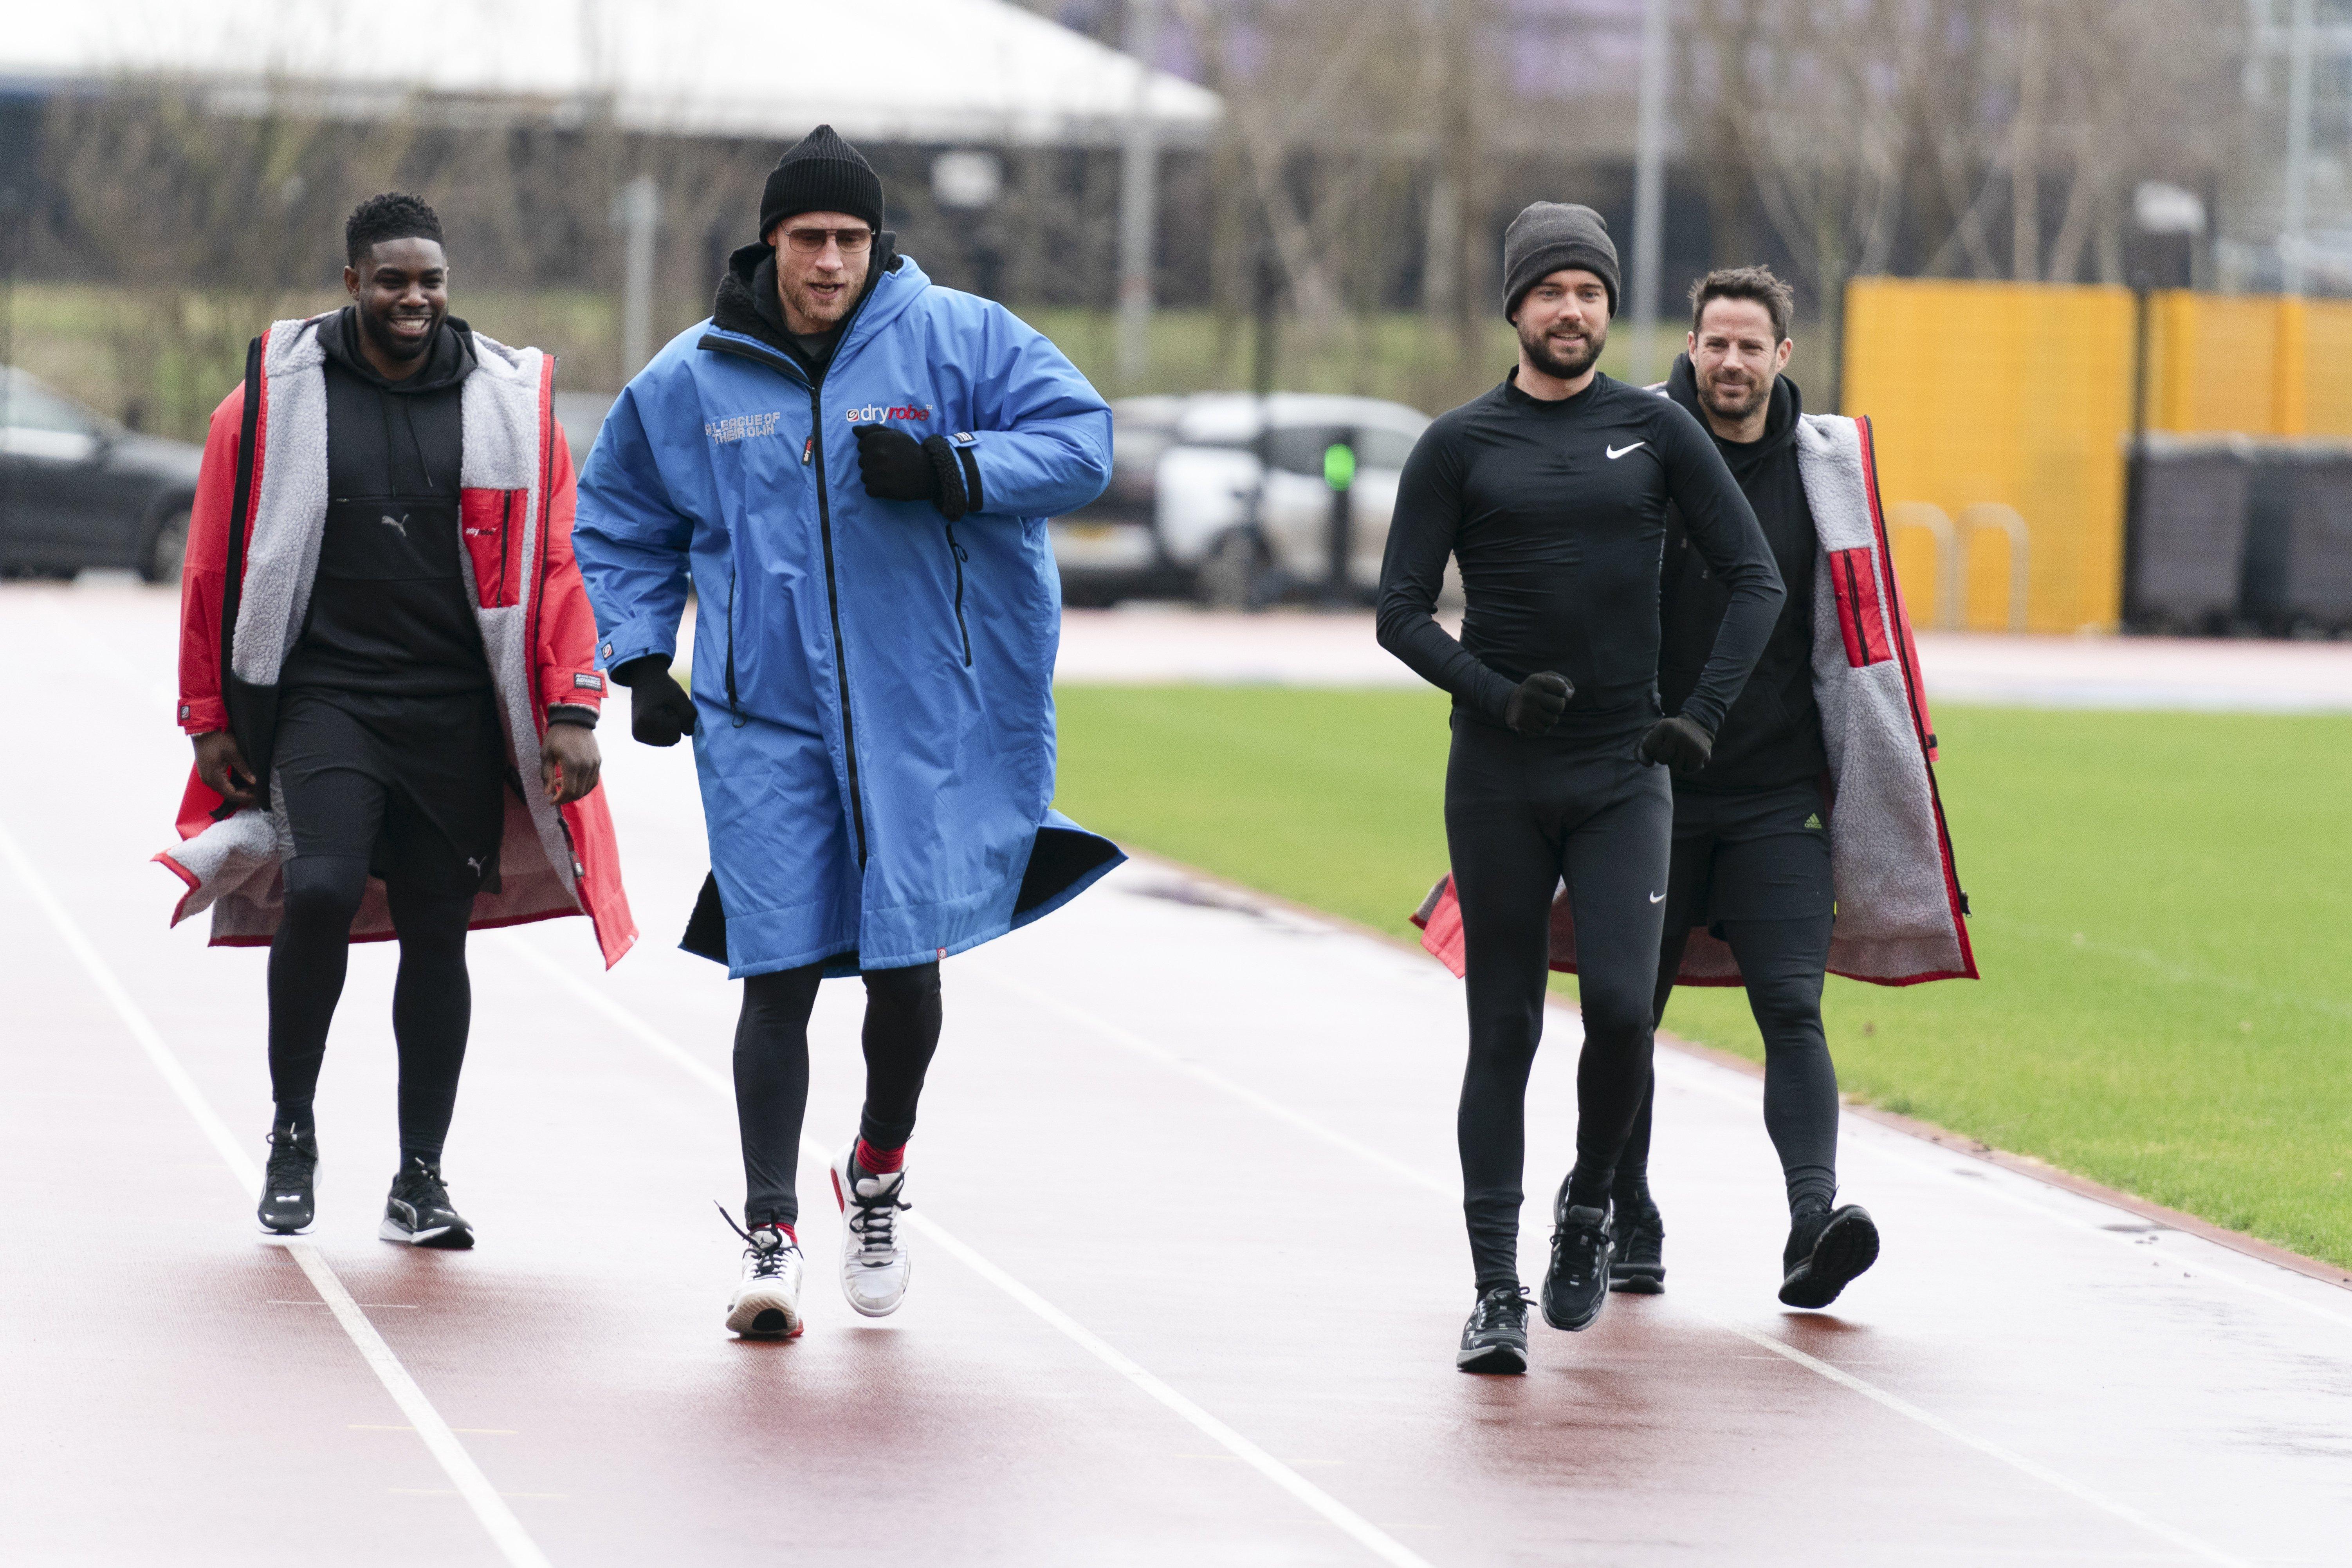 Freddie Flintoff: We're in Scotland, in winter, being chucked in a loch